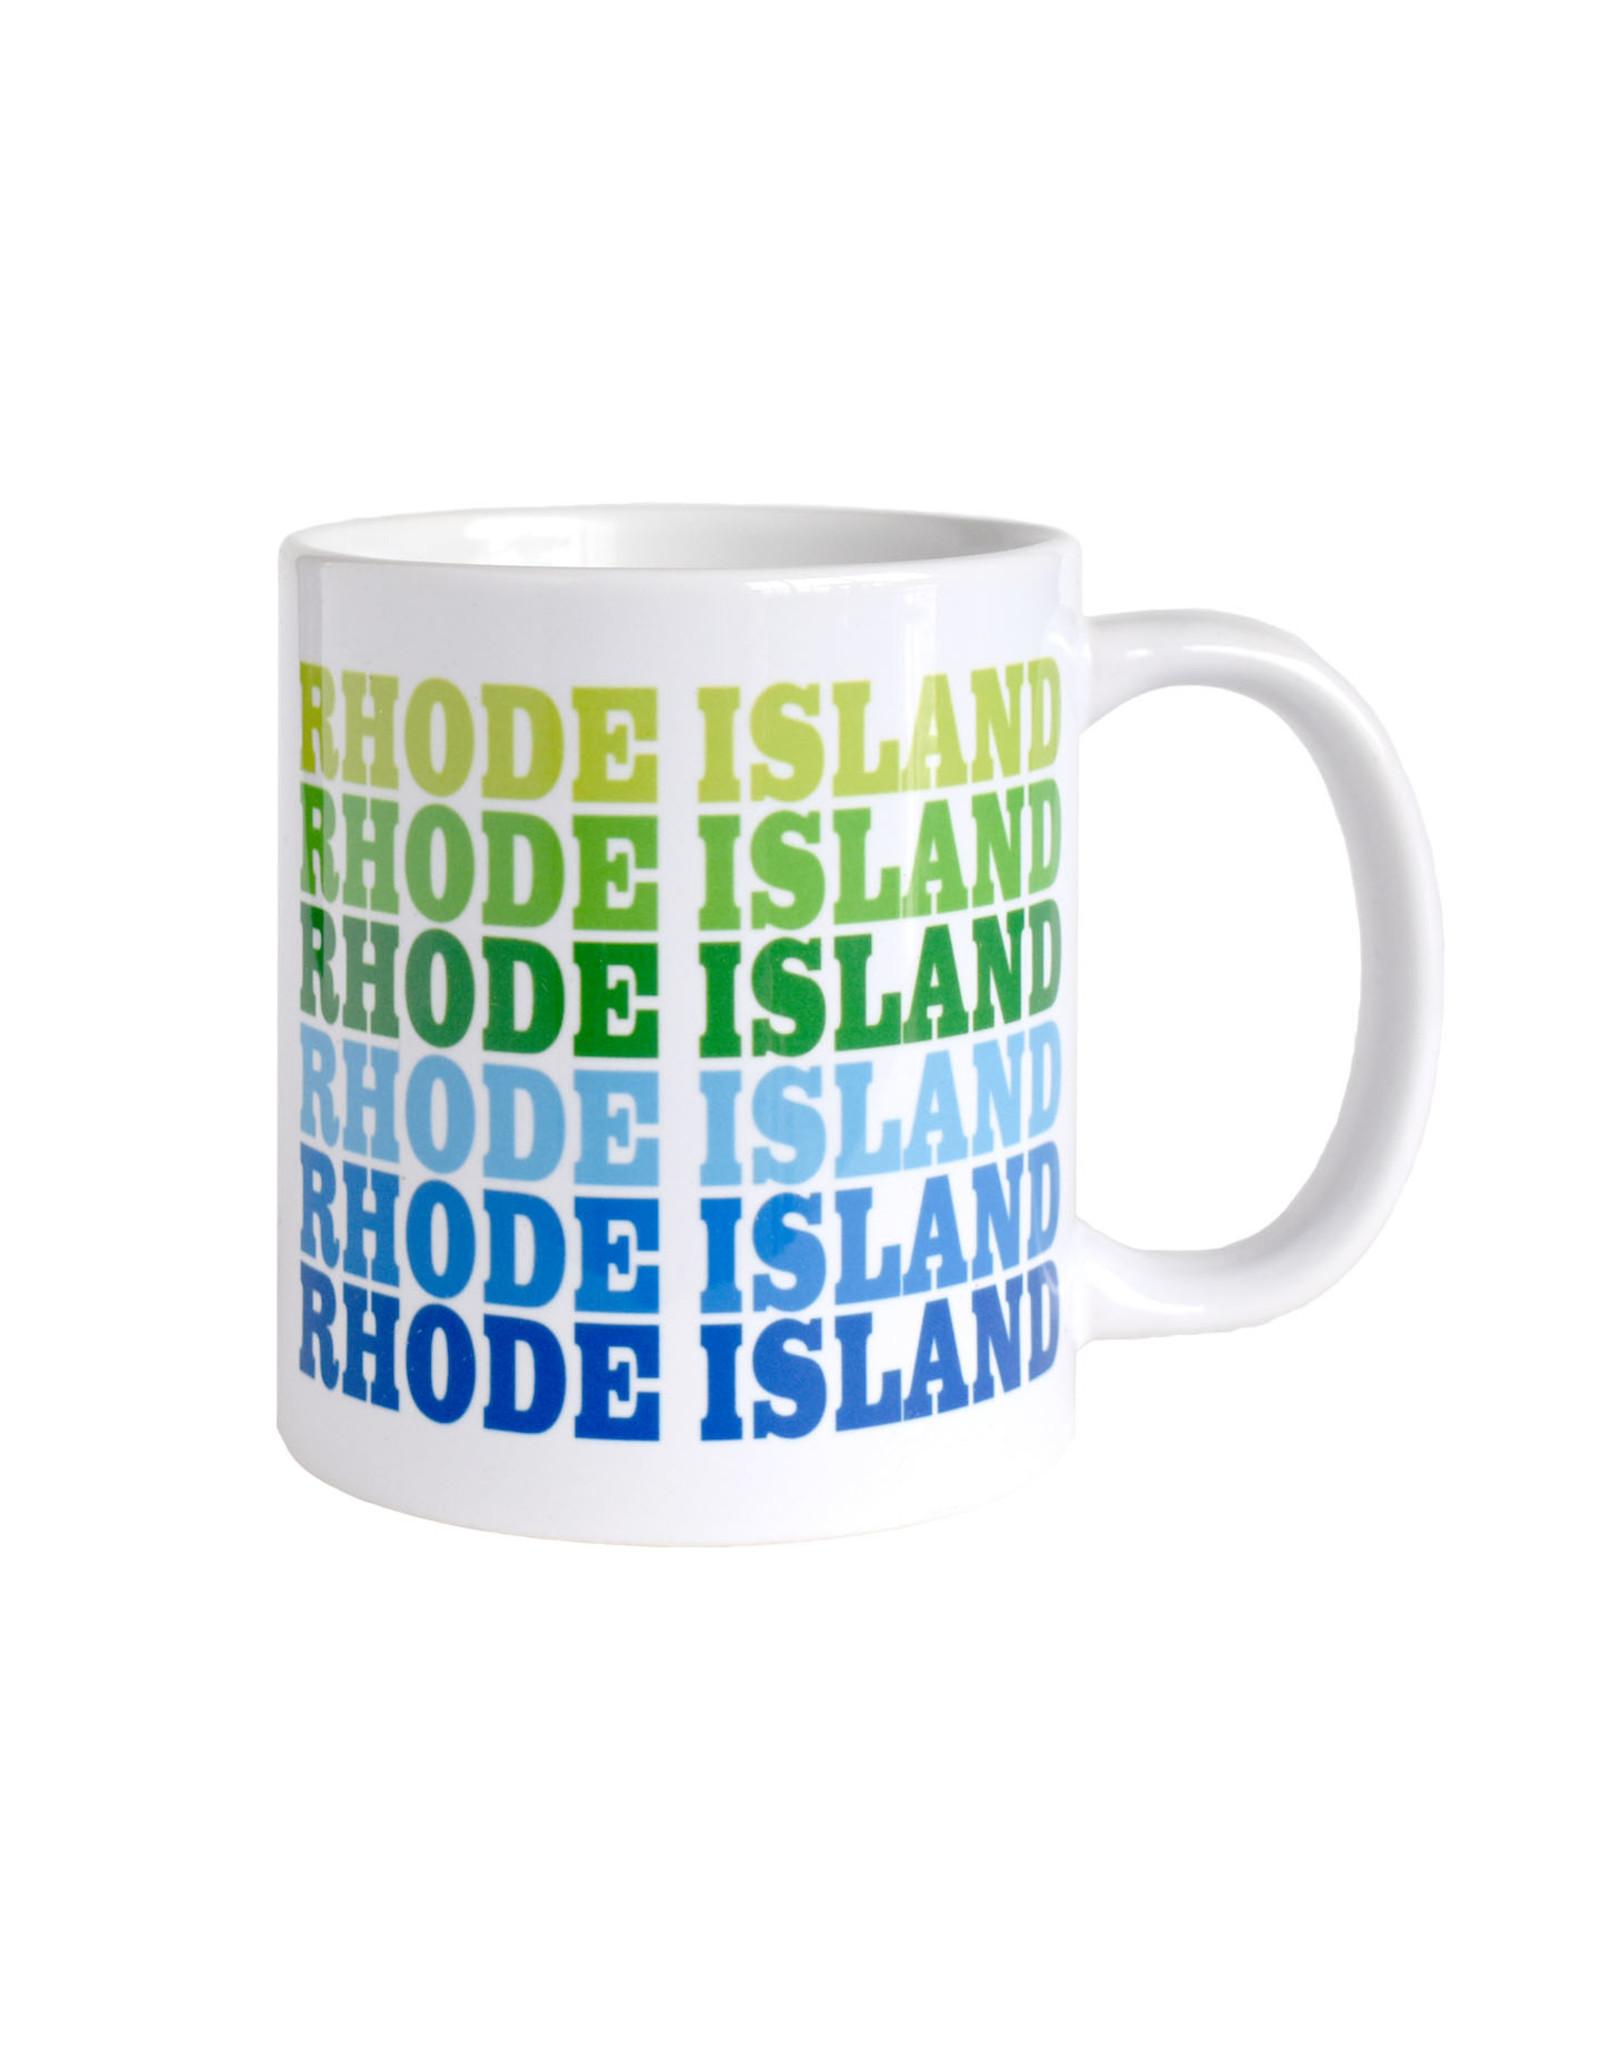 Rhode Island Repeat Mug